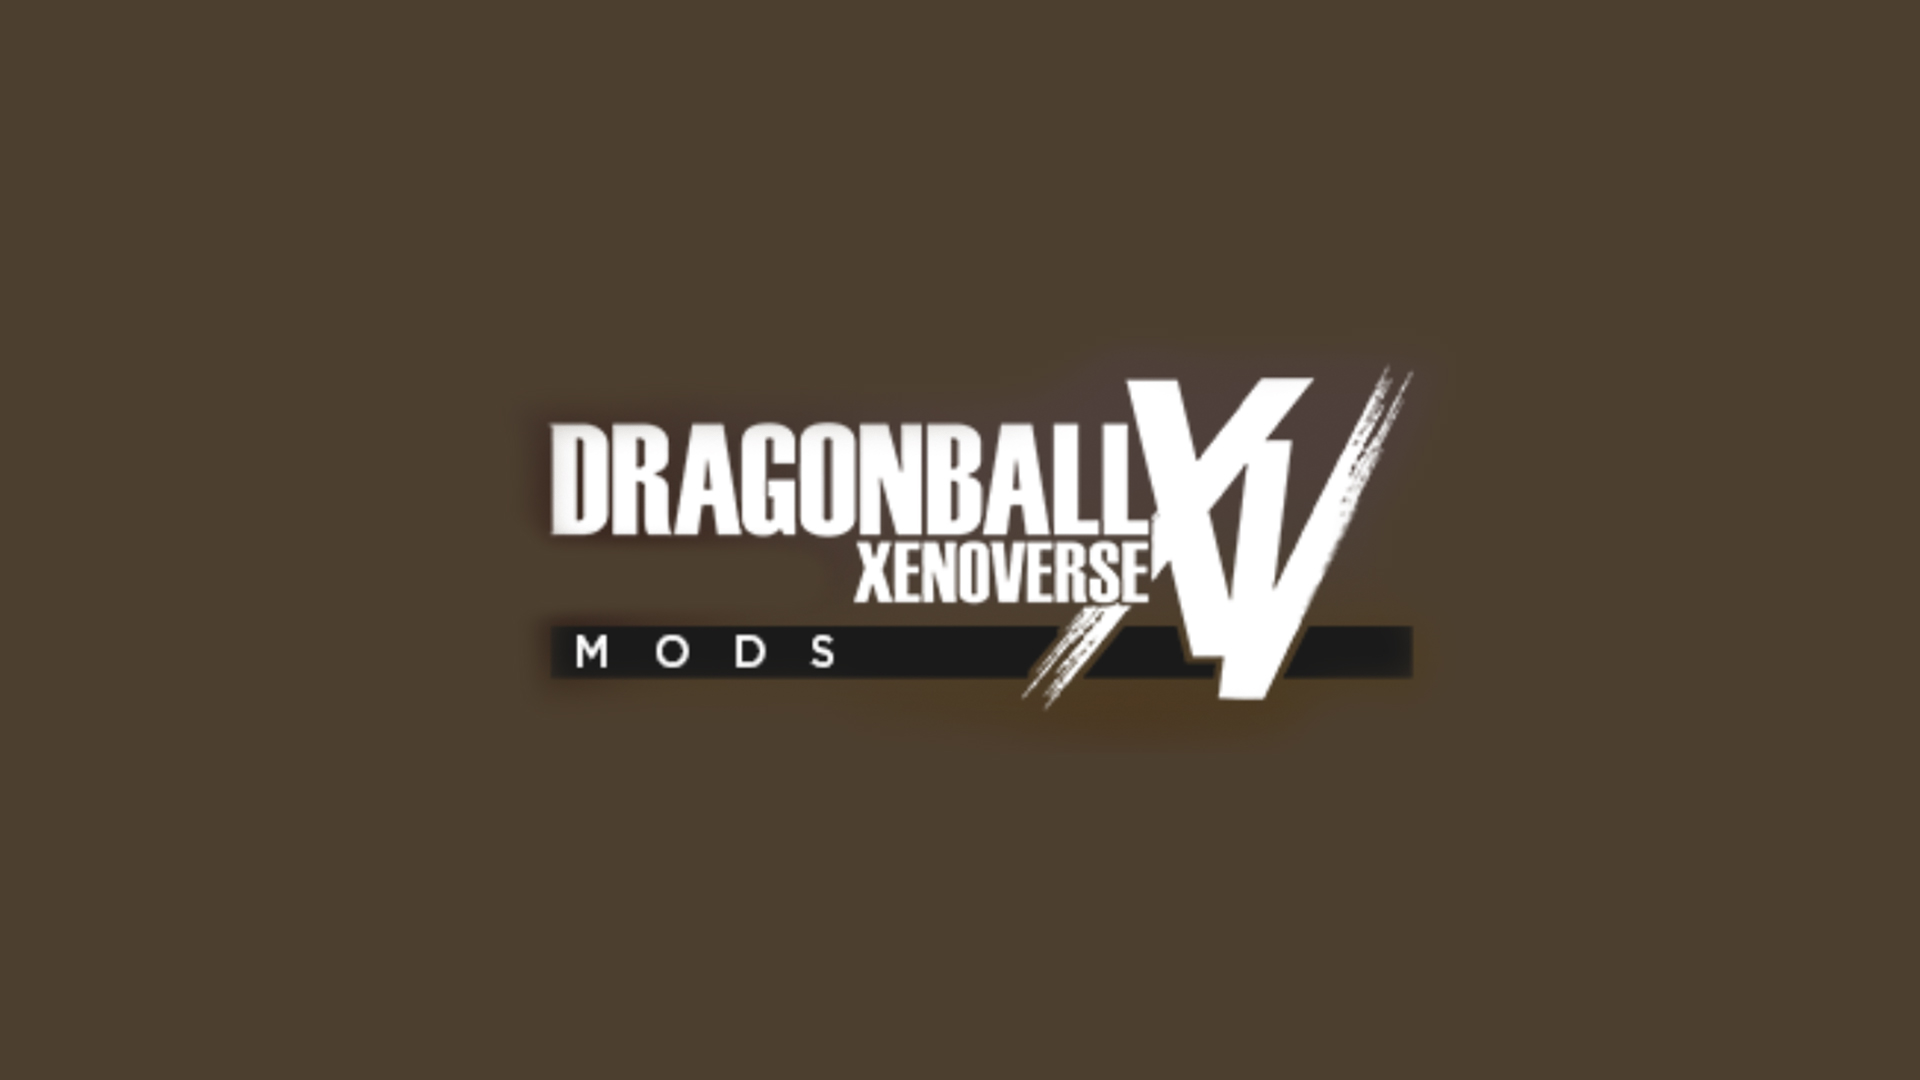 VGM-Xenoverse-Mods-logo